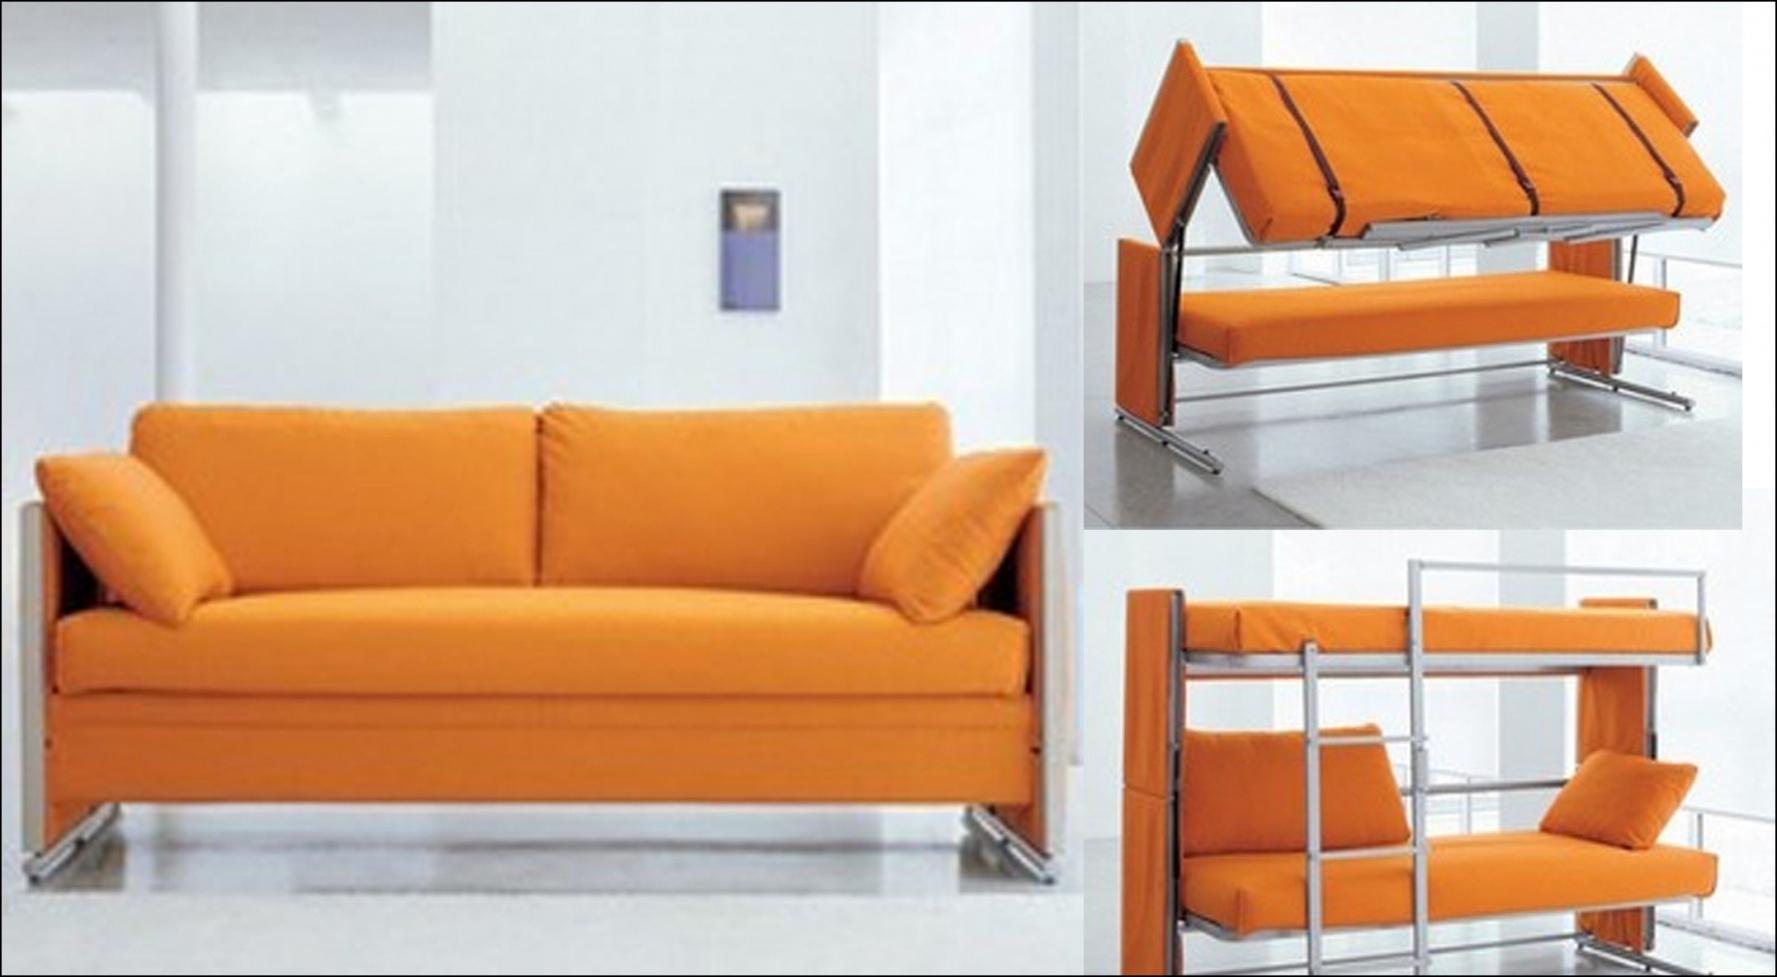 2019 Sofa Bunk Beds Regarding Doc Sofa Bunk Bed For Sale – Master Bedroom Interior Design Ideas (View 1 of 20)